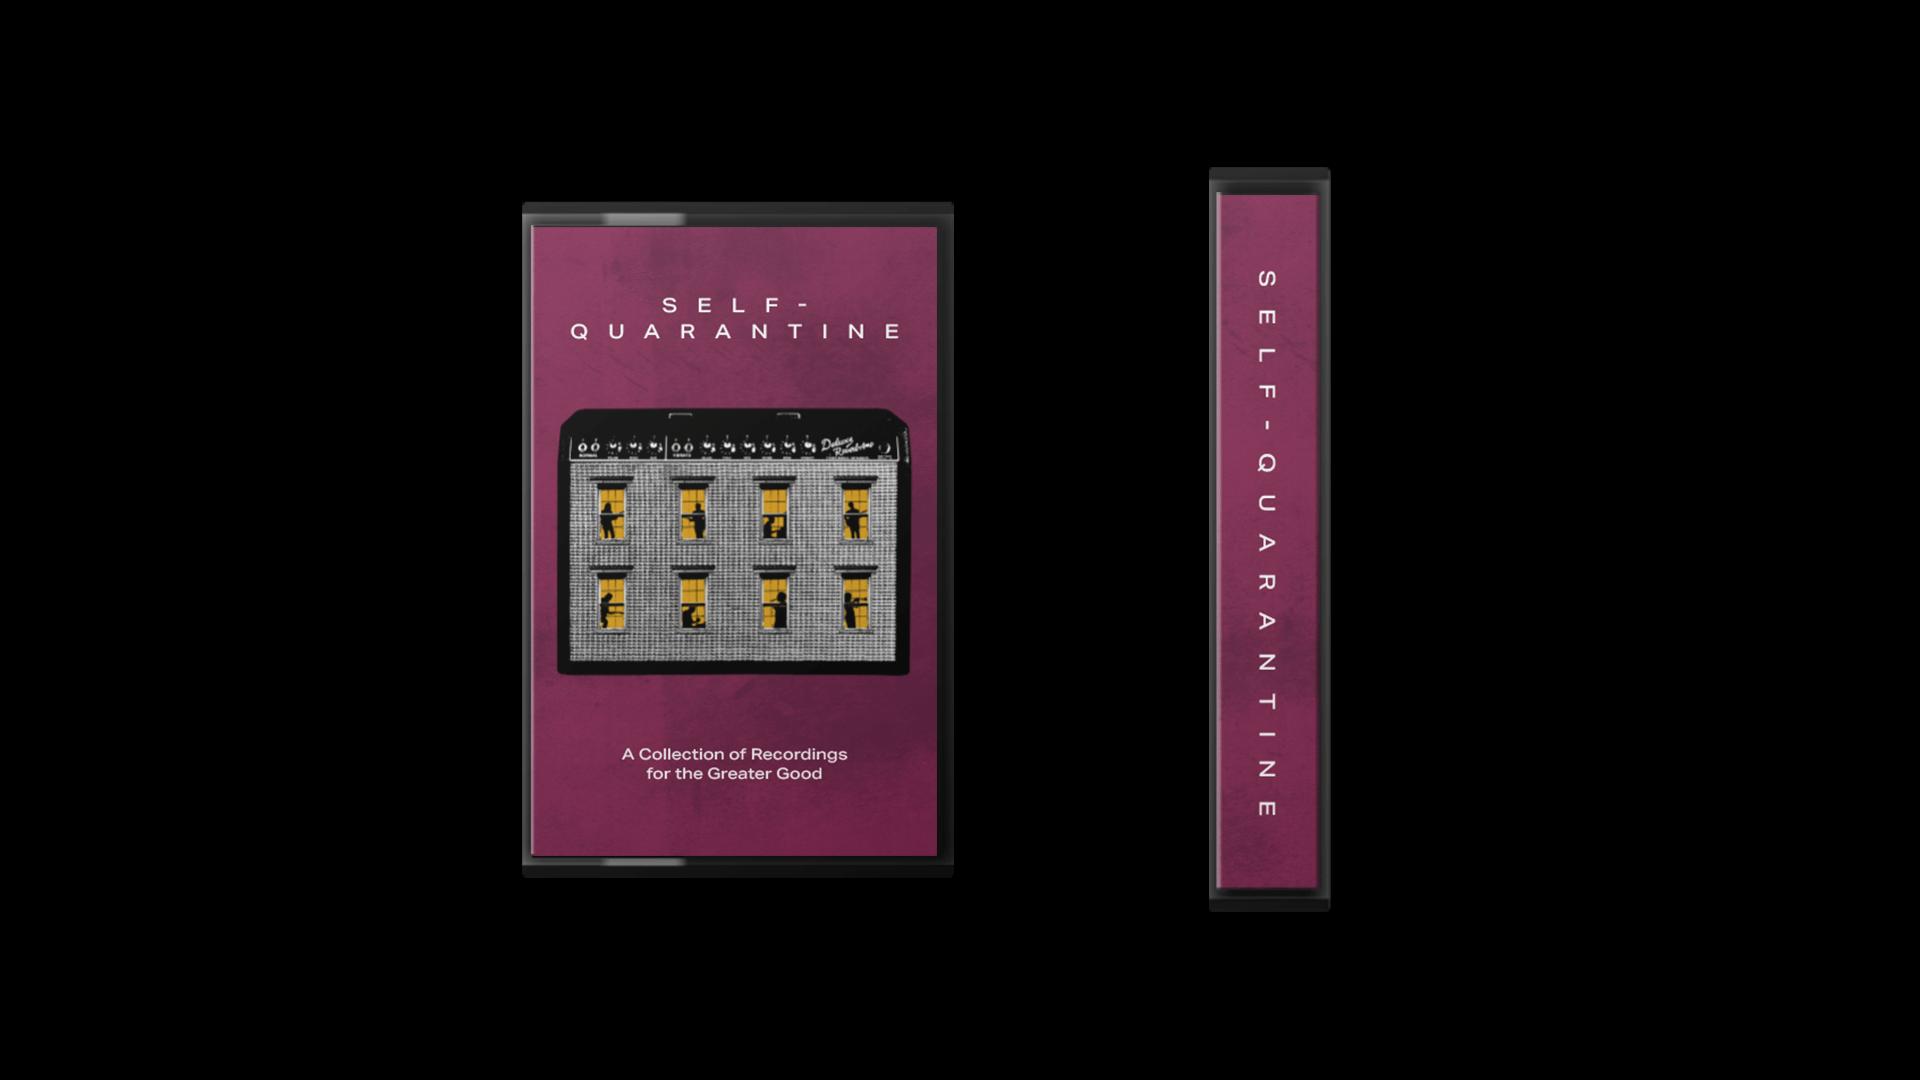 SQ_cassette_1920x1080